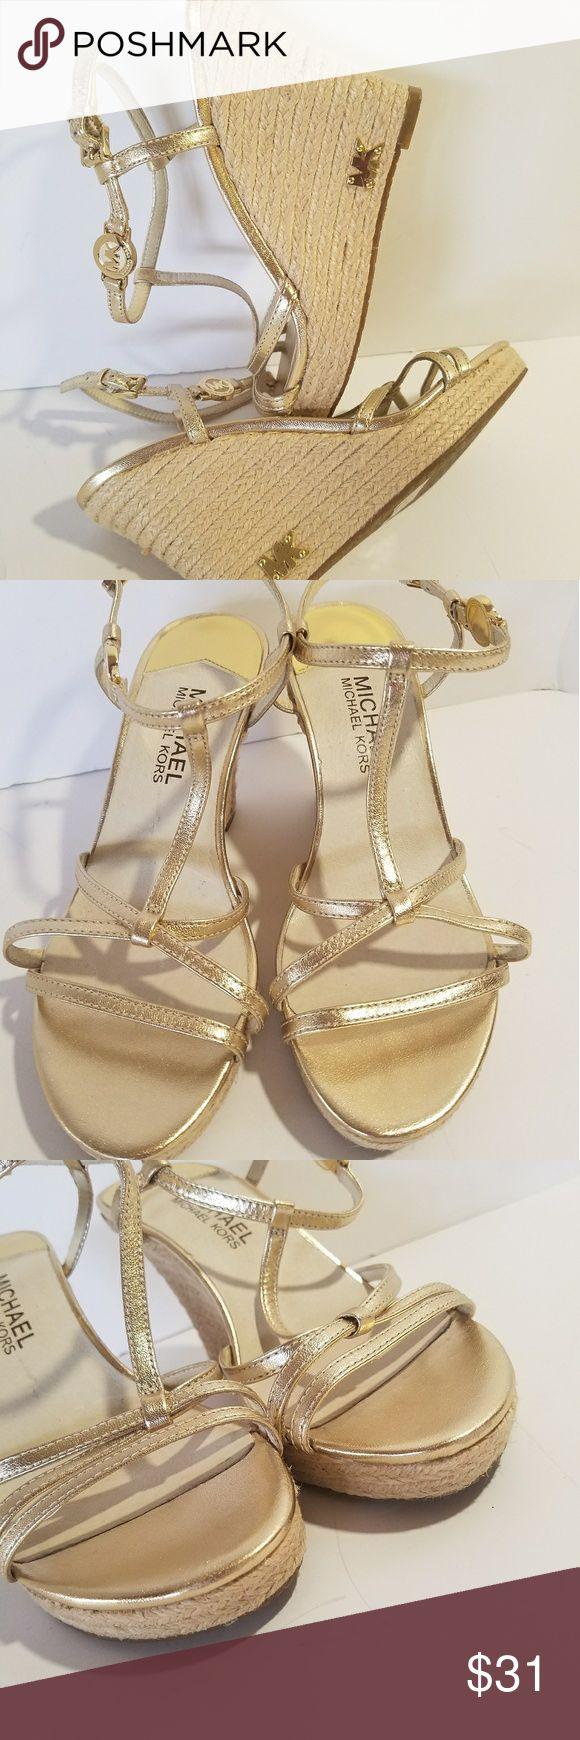 "Michael Kors Gold Wedge Sandals Size 6M NWOT MICHAEL KORS - Gold - 3.5"" Wedge Heels - Sandals - MK Logo Hardware -Size 6M - NWOT Item#01-11S Michael Kors Shoes Wedges"